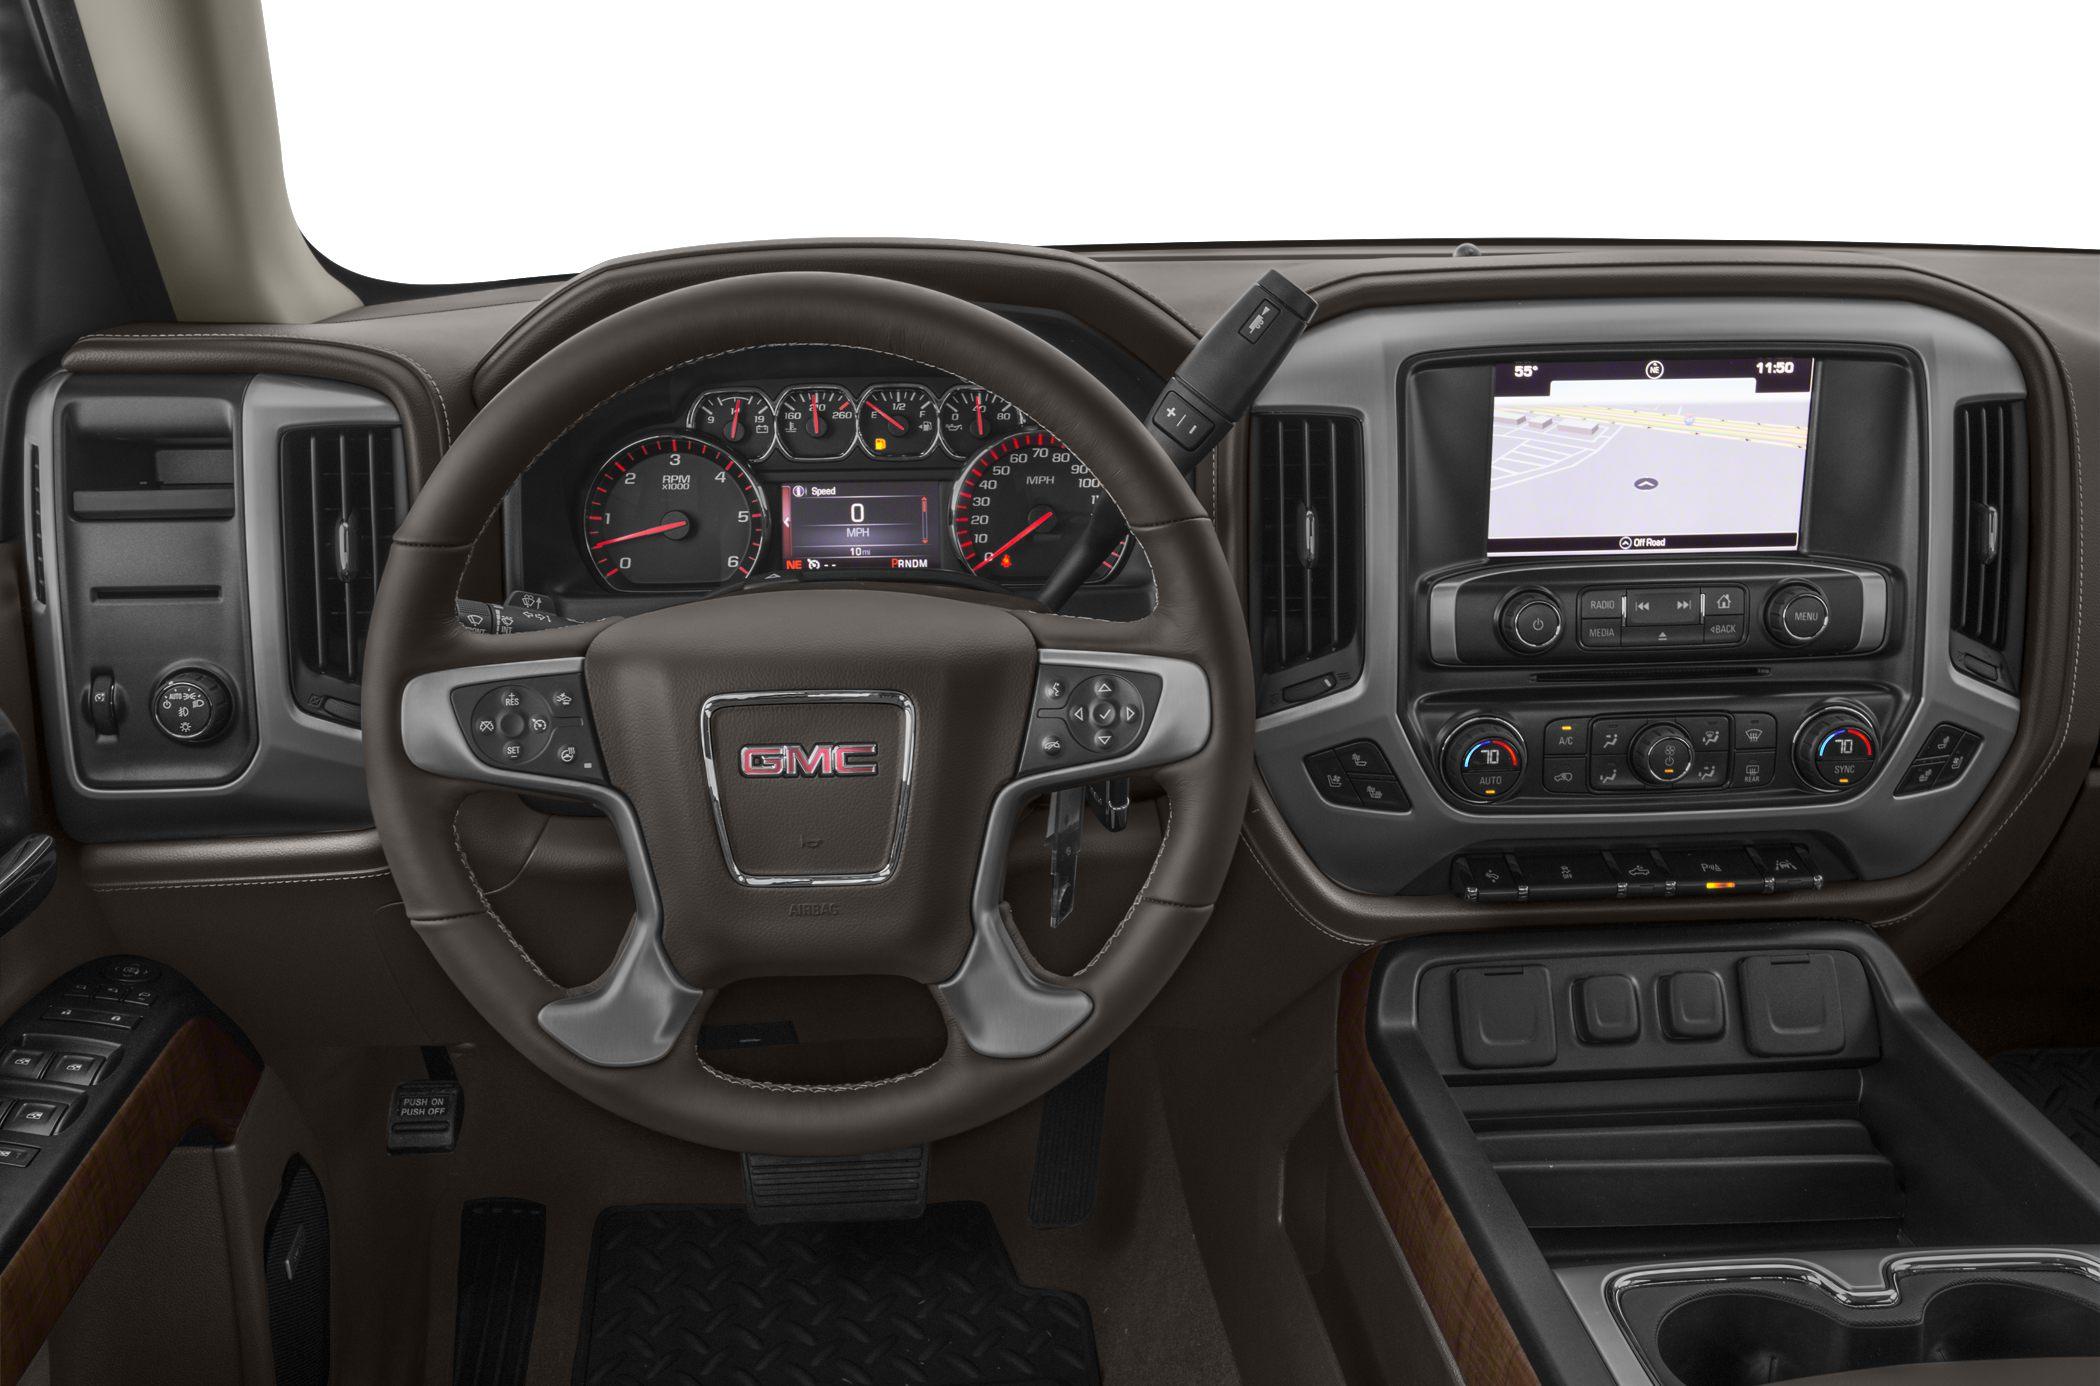 2017 GMC Sierra 1500 Styles & Features Highlights